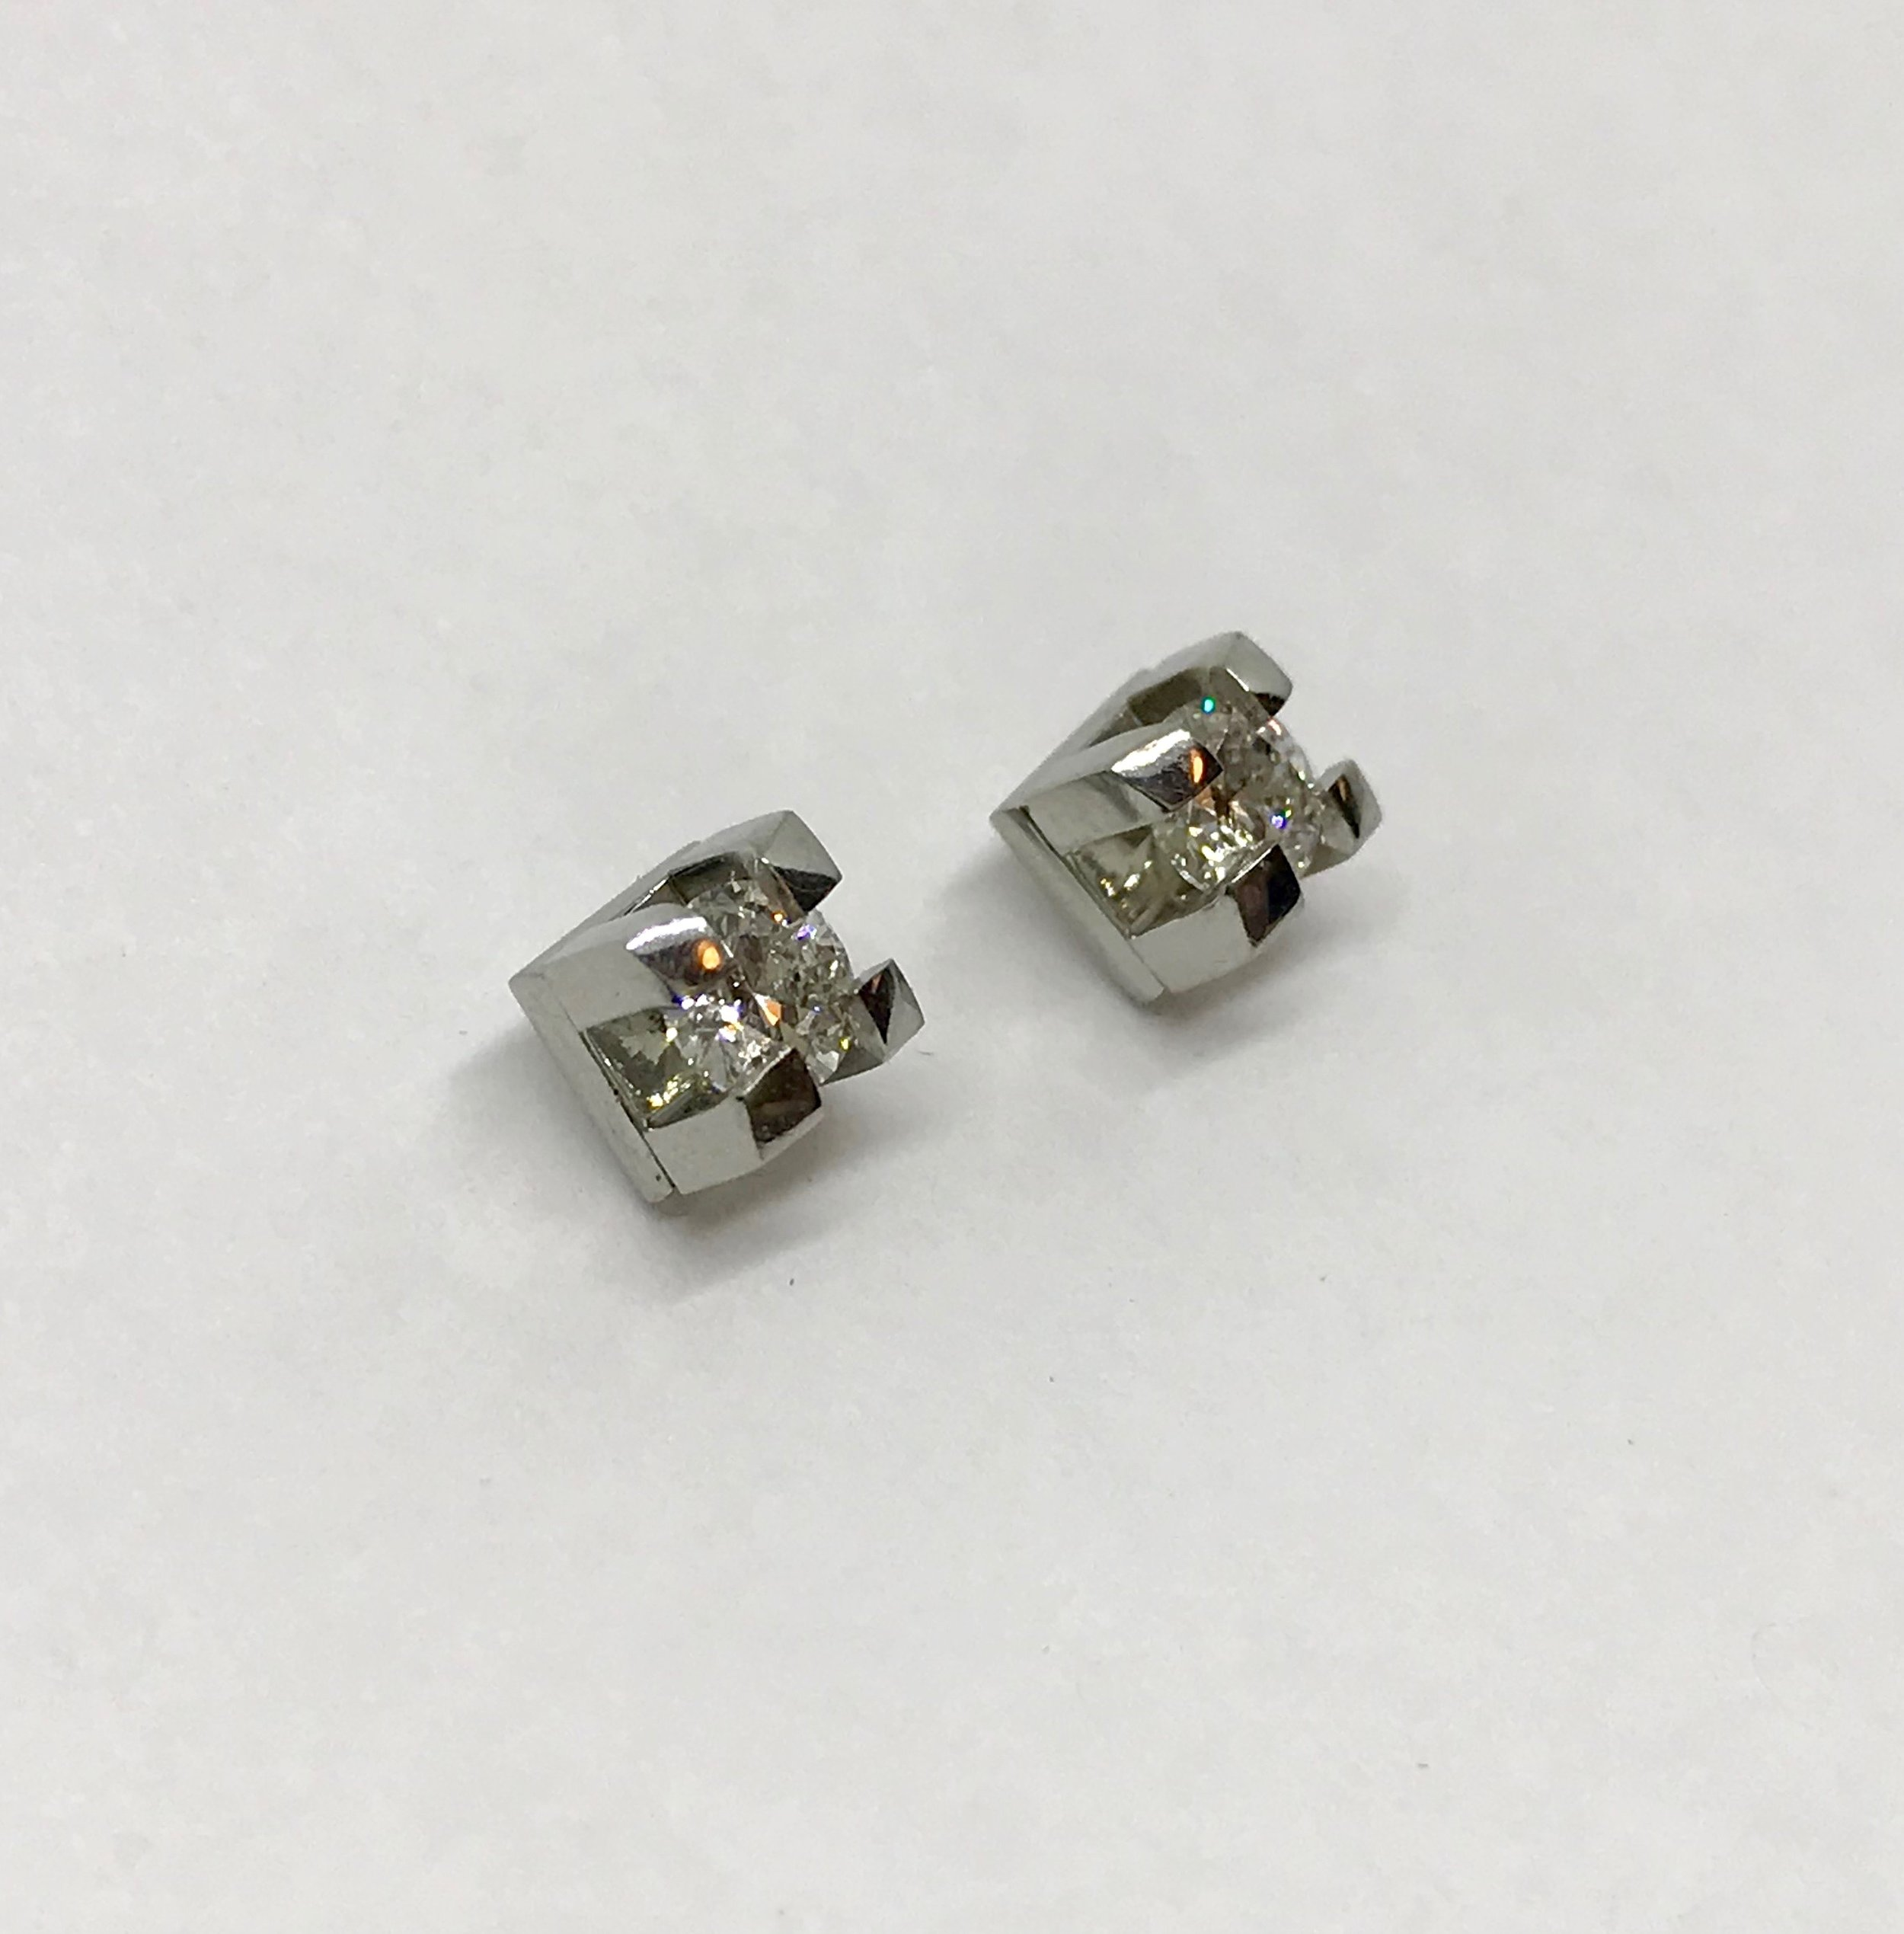 <b>Diamond Ear Studs</b><Br>SOLD<br>19K White Gold, <br> G/H-Si2, TW: 0.60 ct